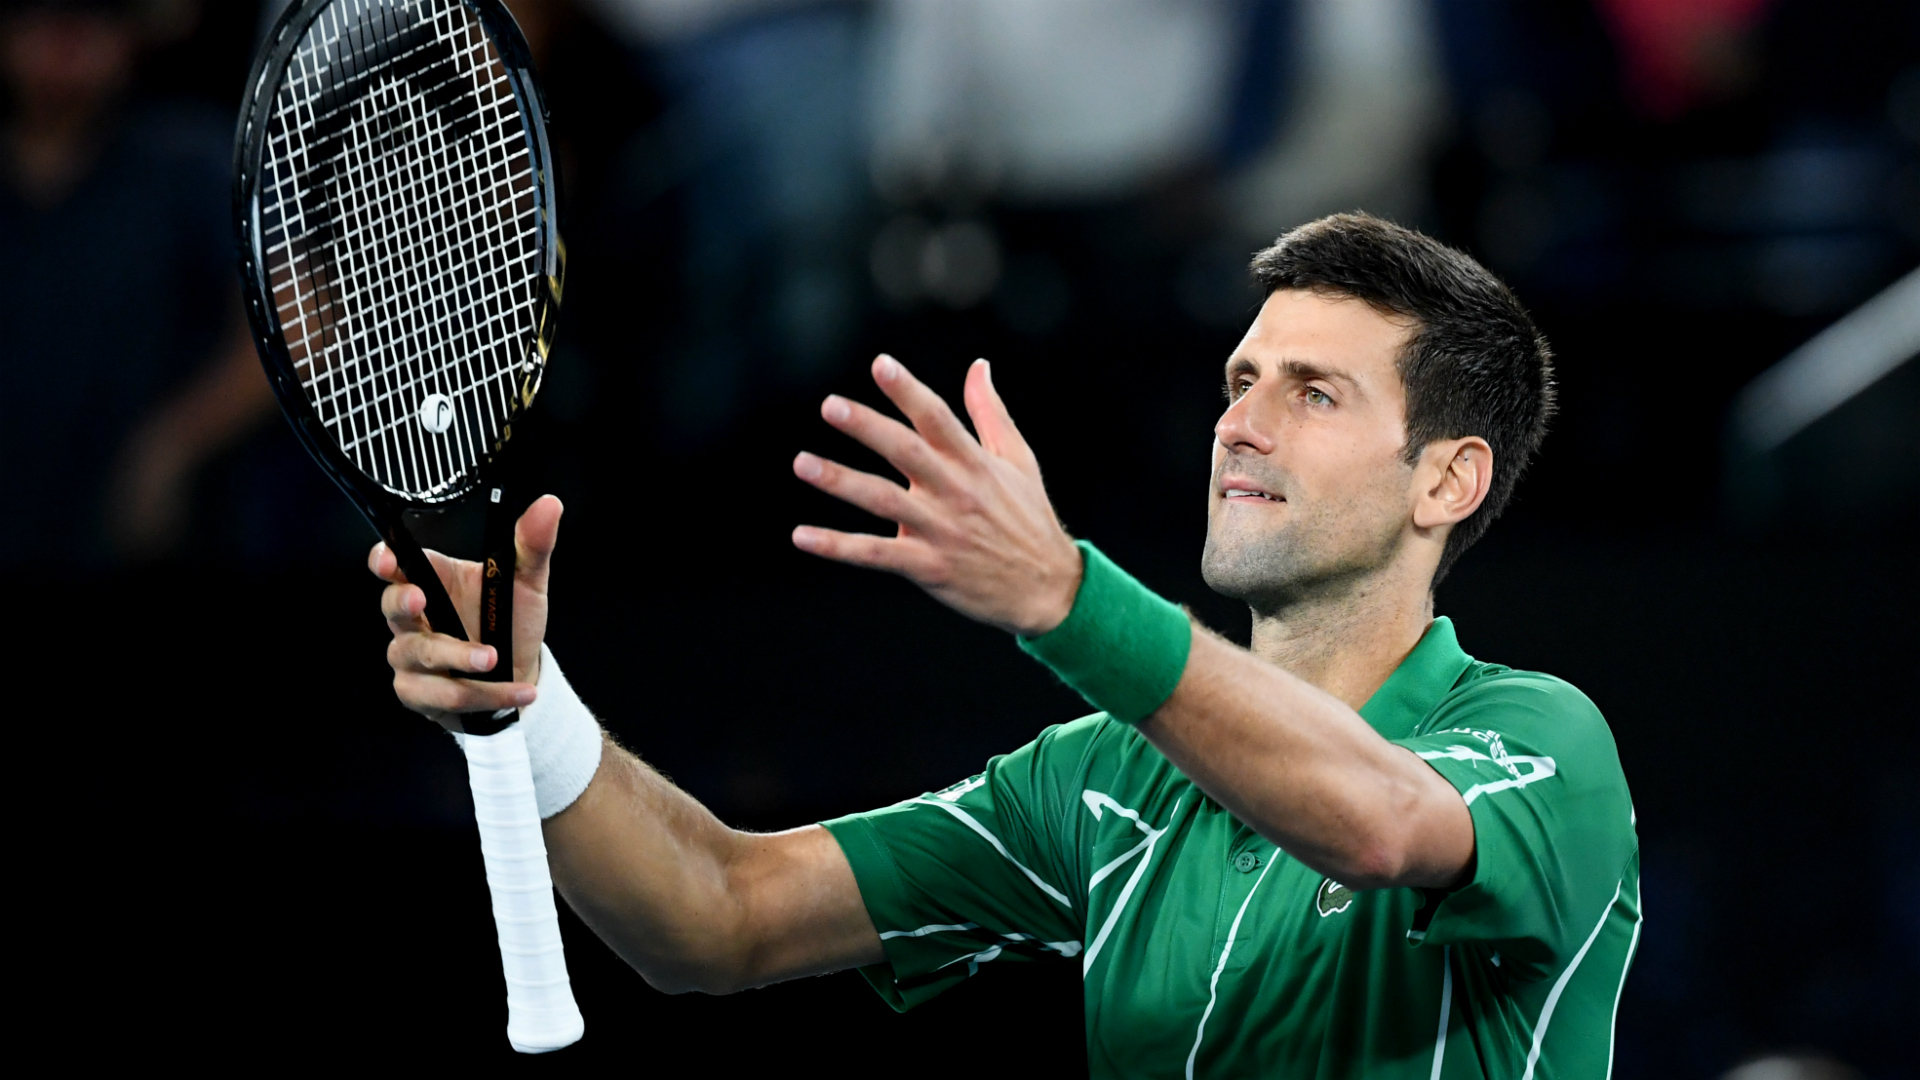 Australian Open 2020: Djokovic insists he is not 'dominating' Federer despite winning streak